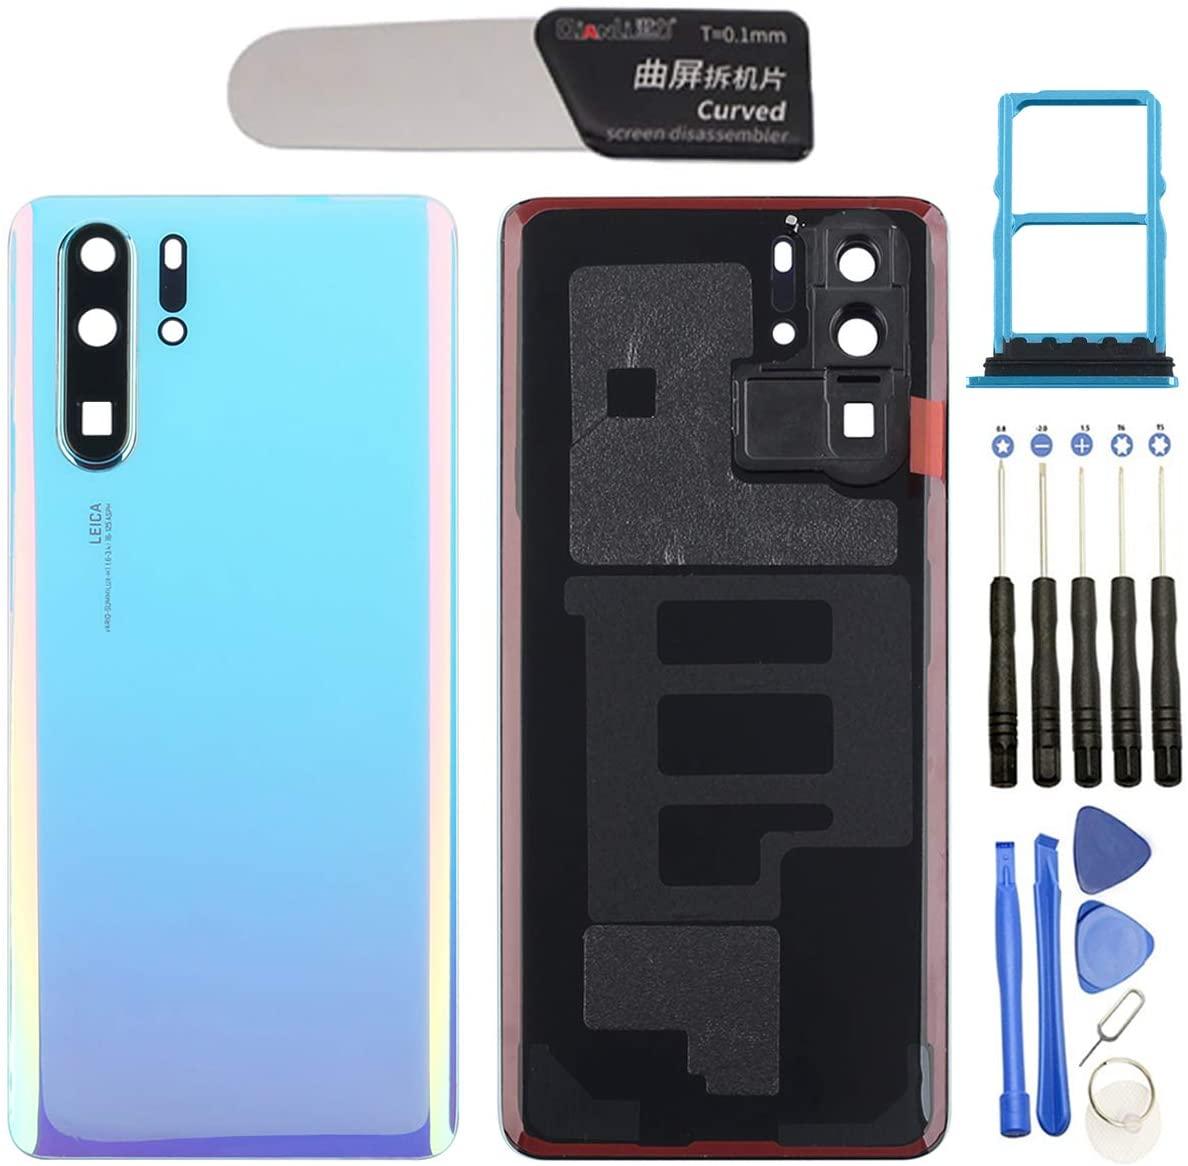 YHX-US Replacement for Huawei P30 Pro VOG-L29 VOG-L09 VOG-L04 VOG-AL00 6.47